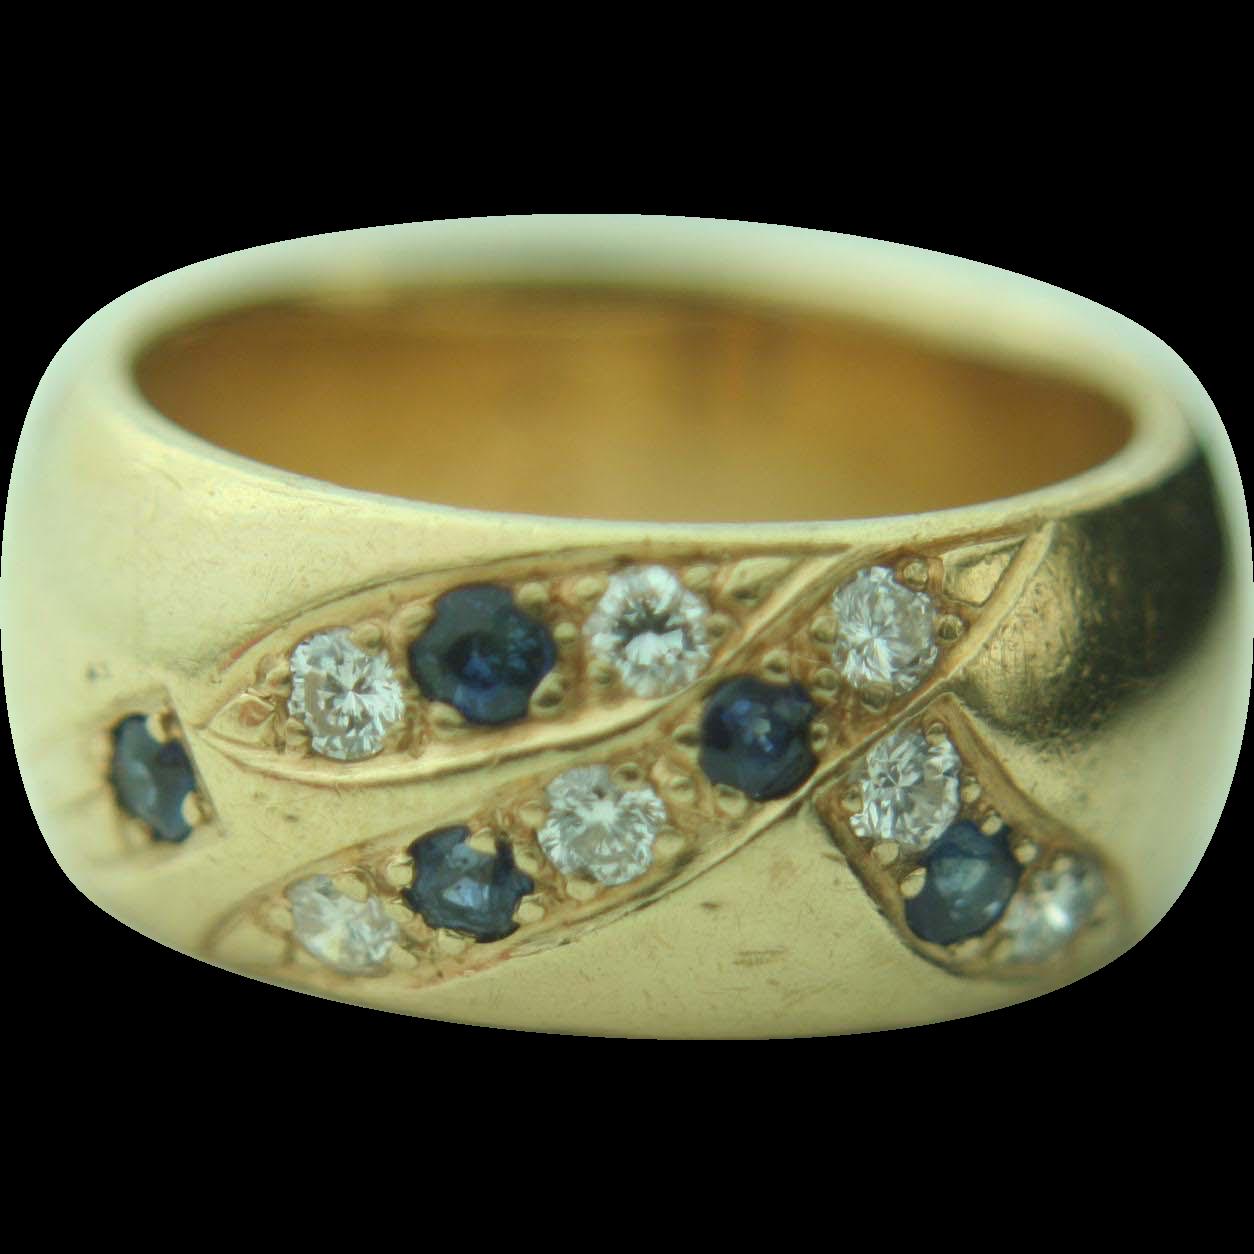 14k Yellow Gold Sapphire & Diamond Bezel Band Ring - Heavy 15.3g